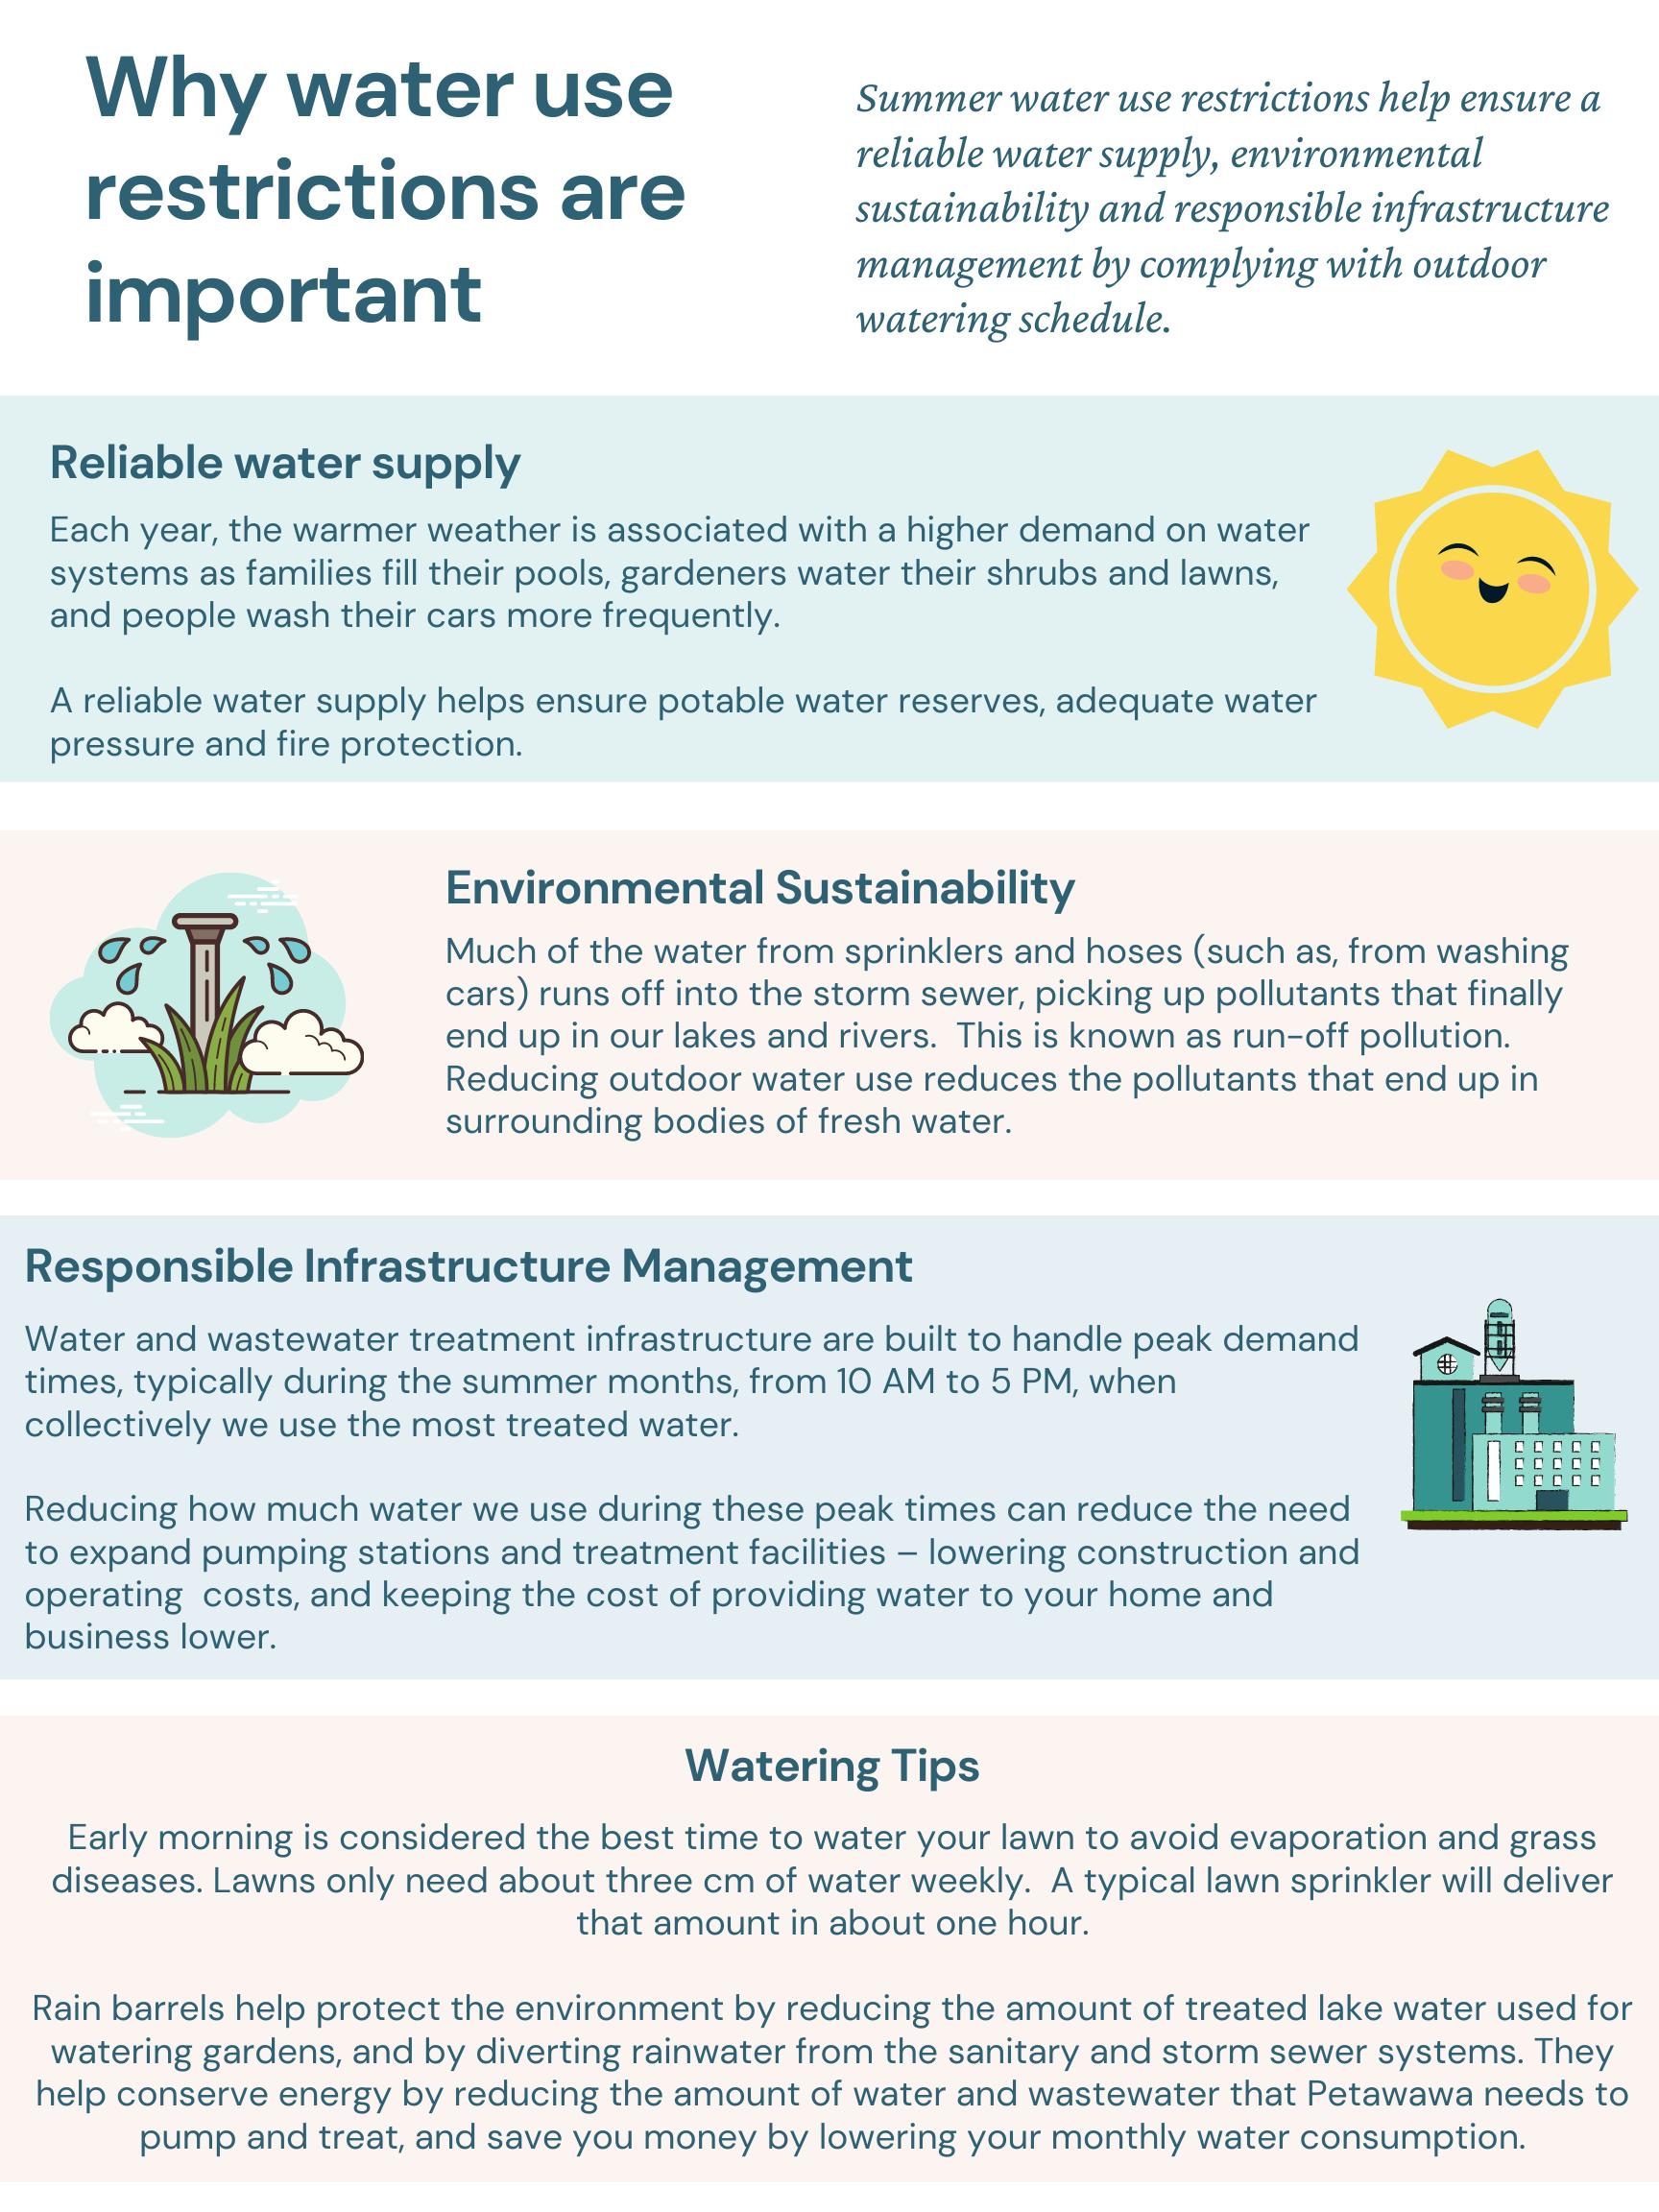 water restrictions, watering, lawn watering, rain, water